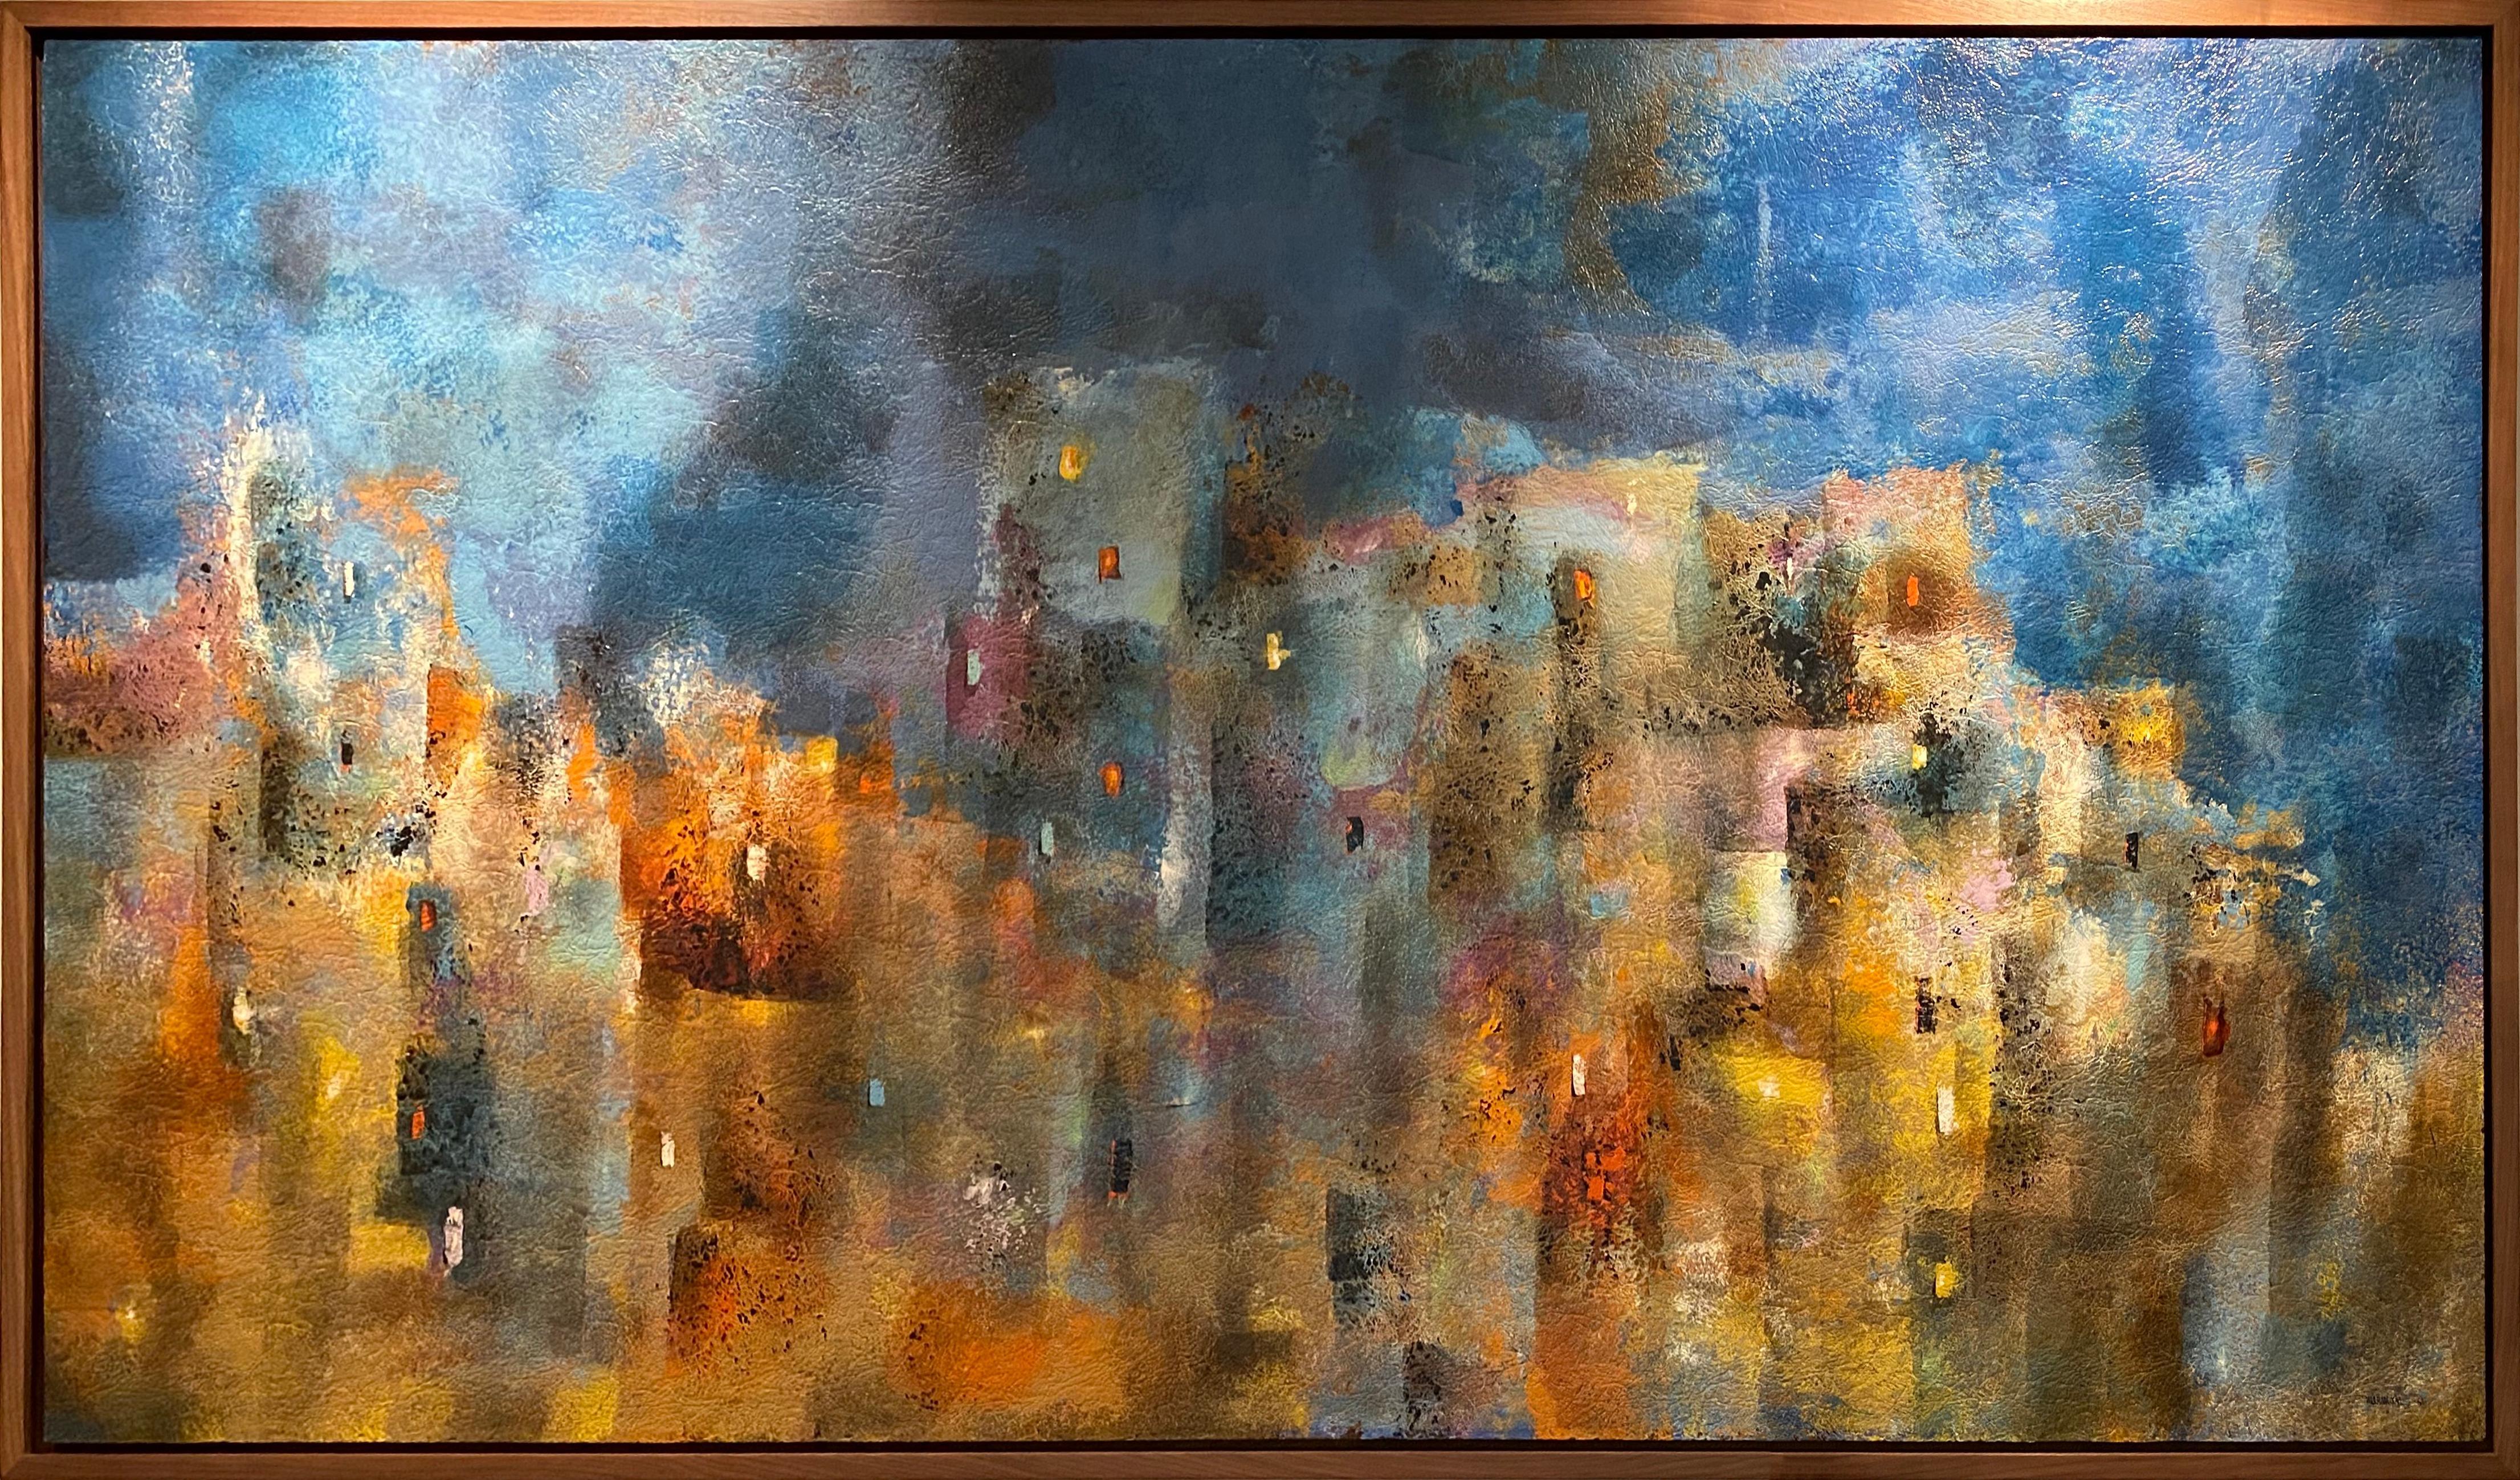 Ruinas, Abstract Painting by Leonardo Nierman